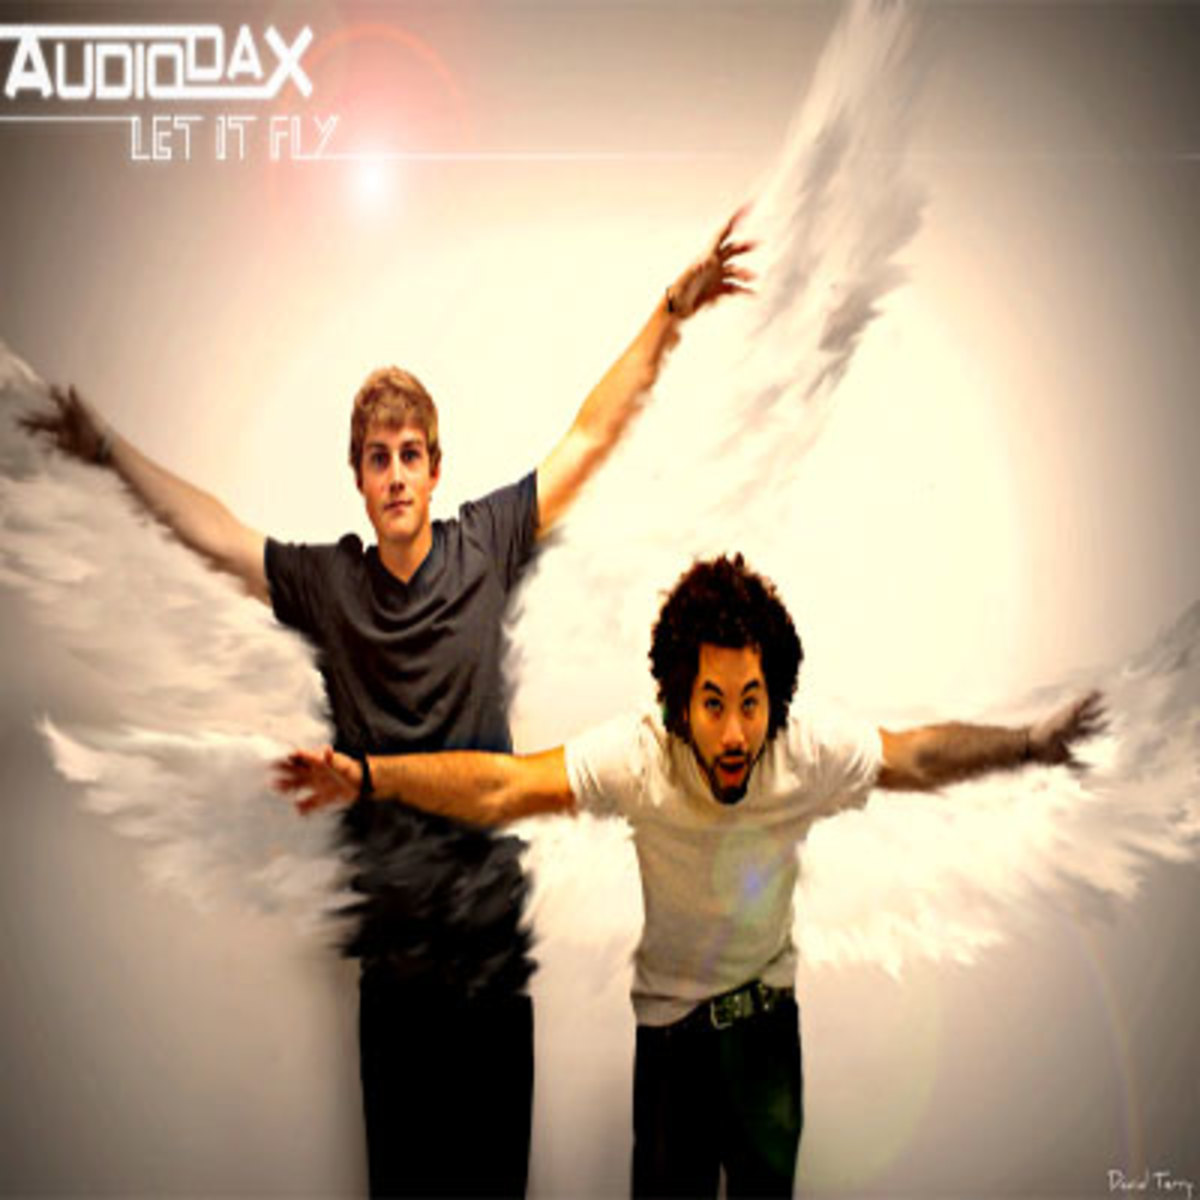 audiodax-letitfly.jpg